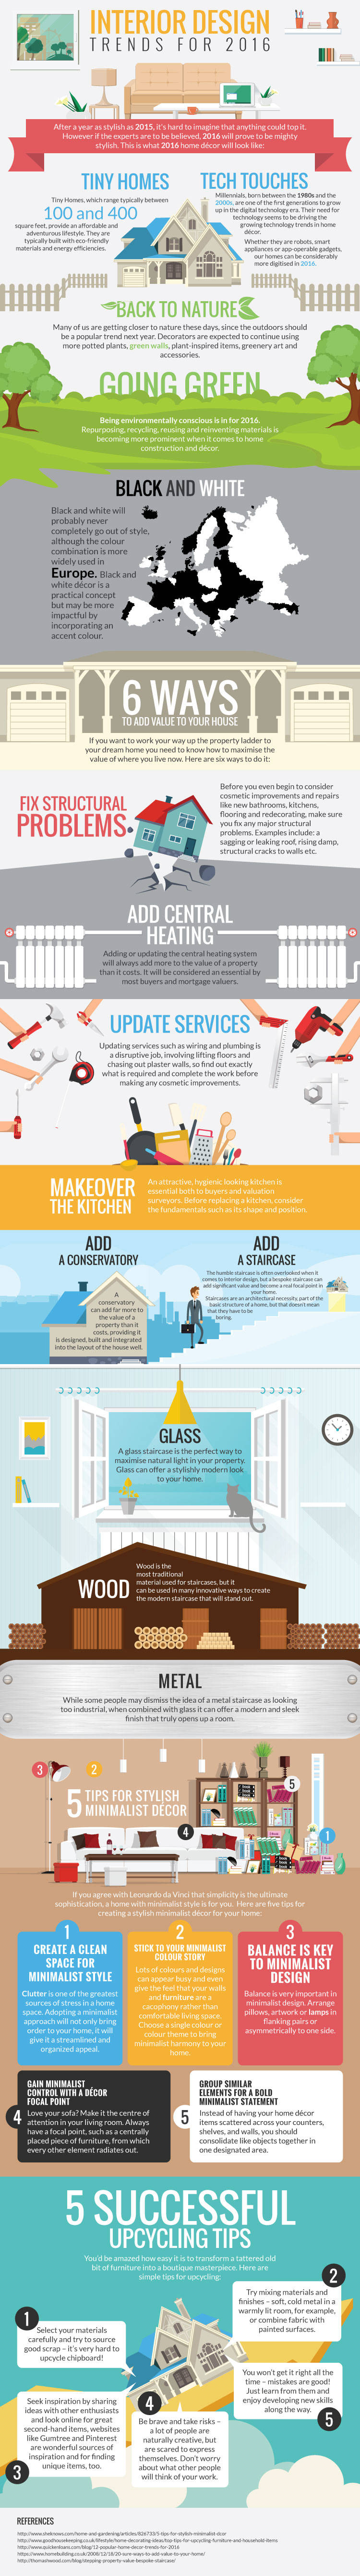 Interior Design Trends for 2016